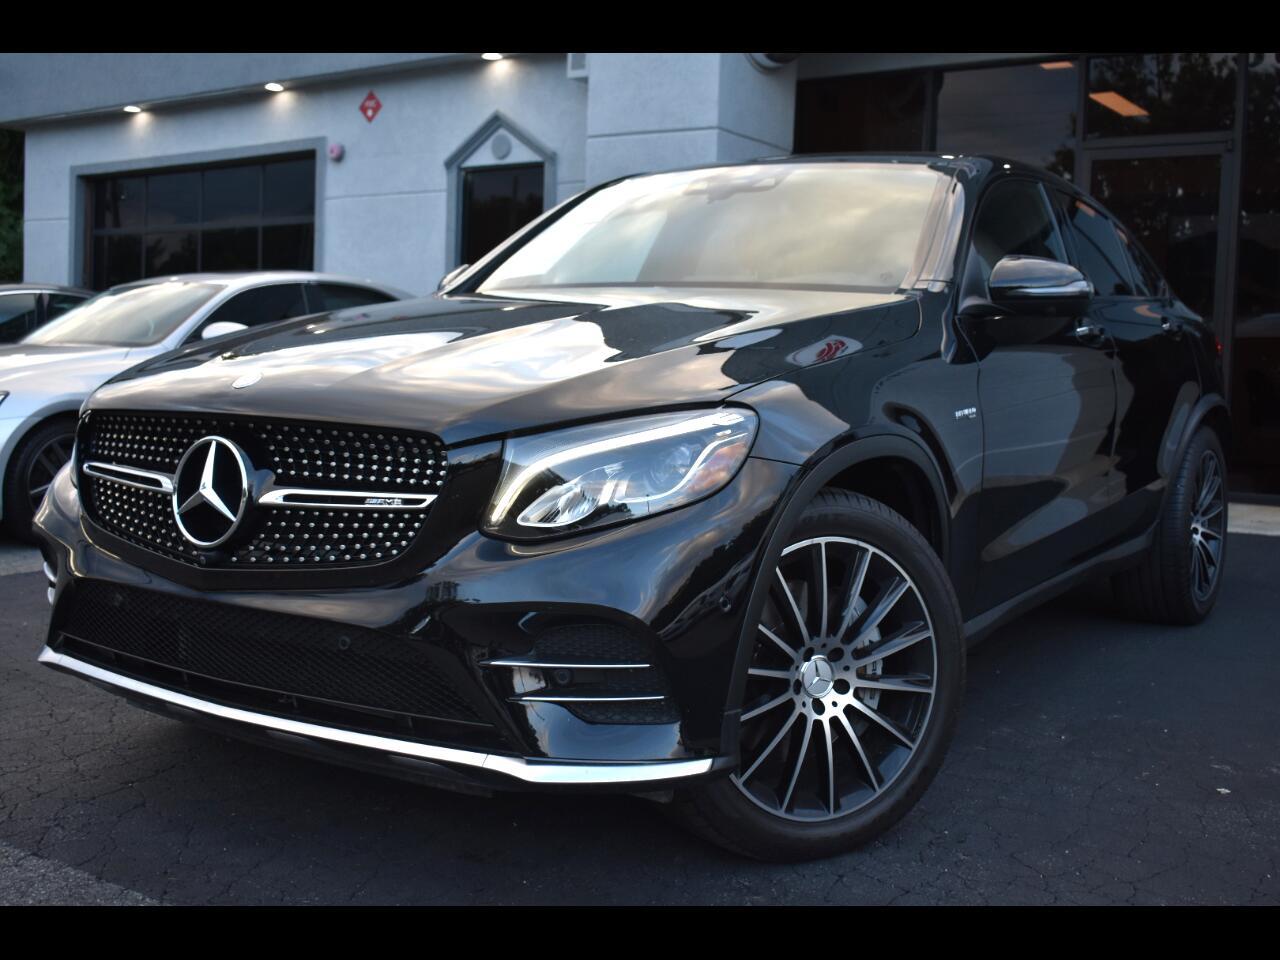 Mercedes-Benz GLC AMG GLC 43 4MATIC Coupe 2017